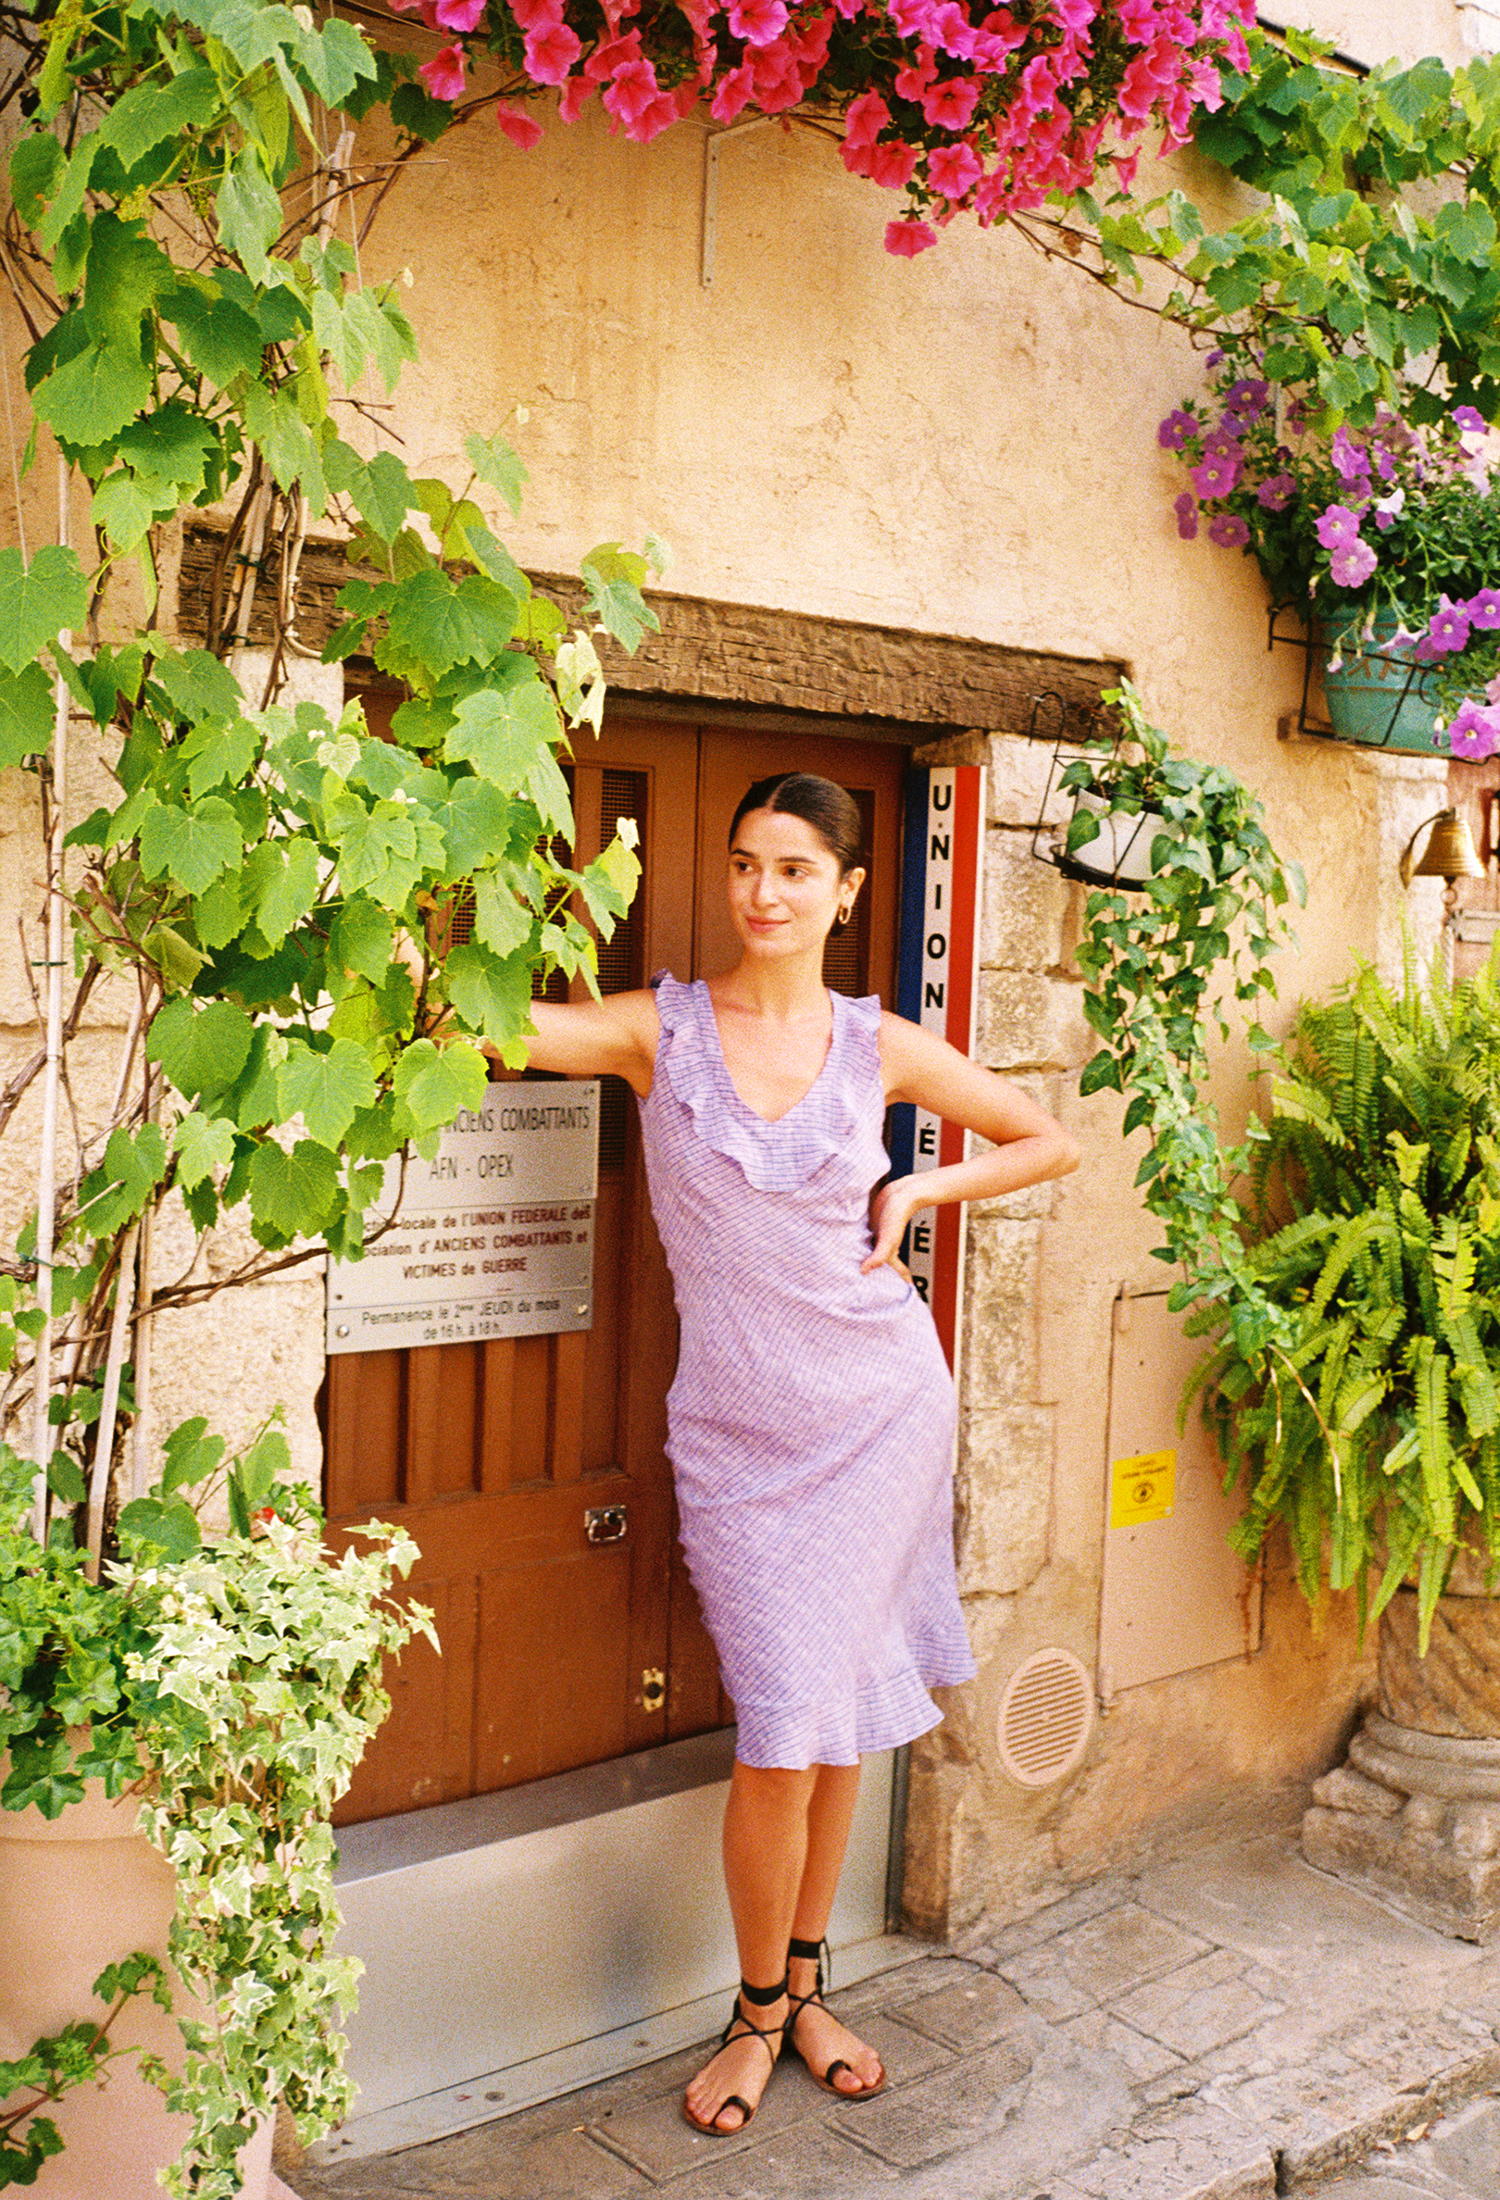 CIAO_LUCIA_GUIDE_FRENCH_RIVERA_ELIANA_RODRIGUEZ_HOTEL_WEEKEND4.jpg